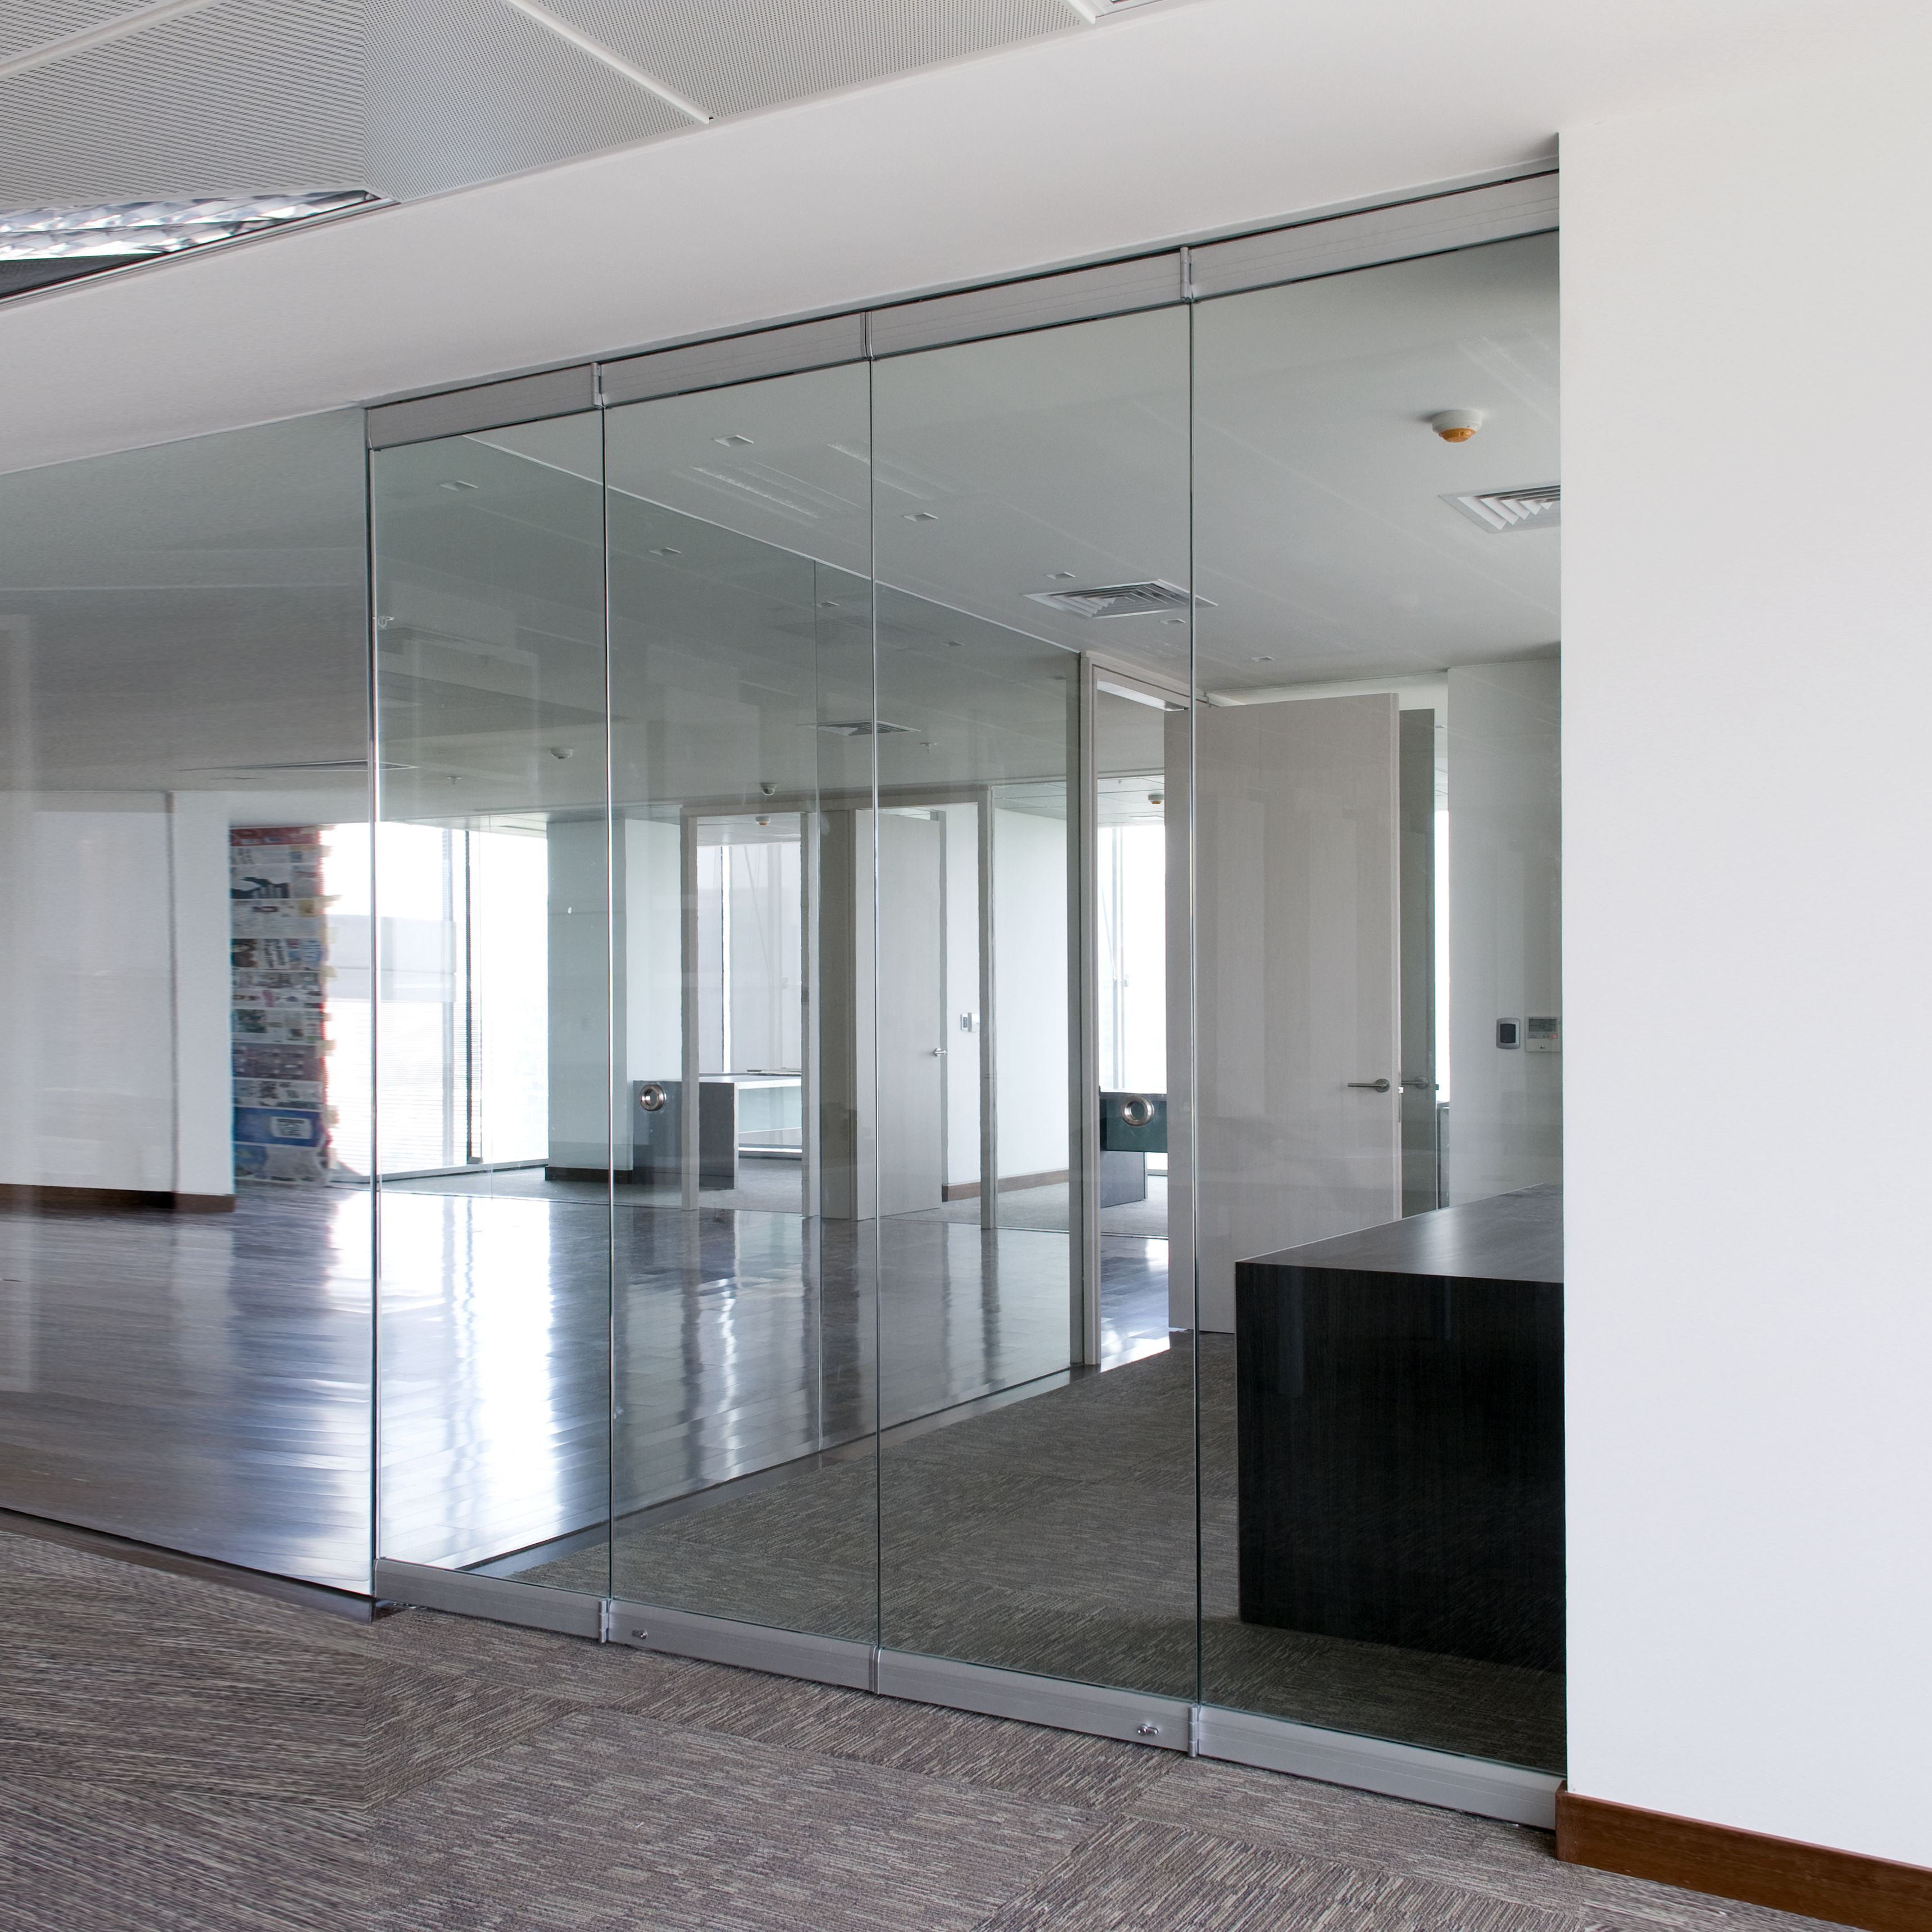 sistema plegable colgante para puertas de vidrio de hasta